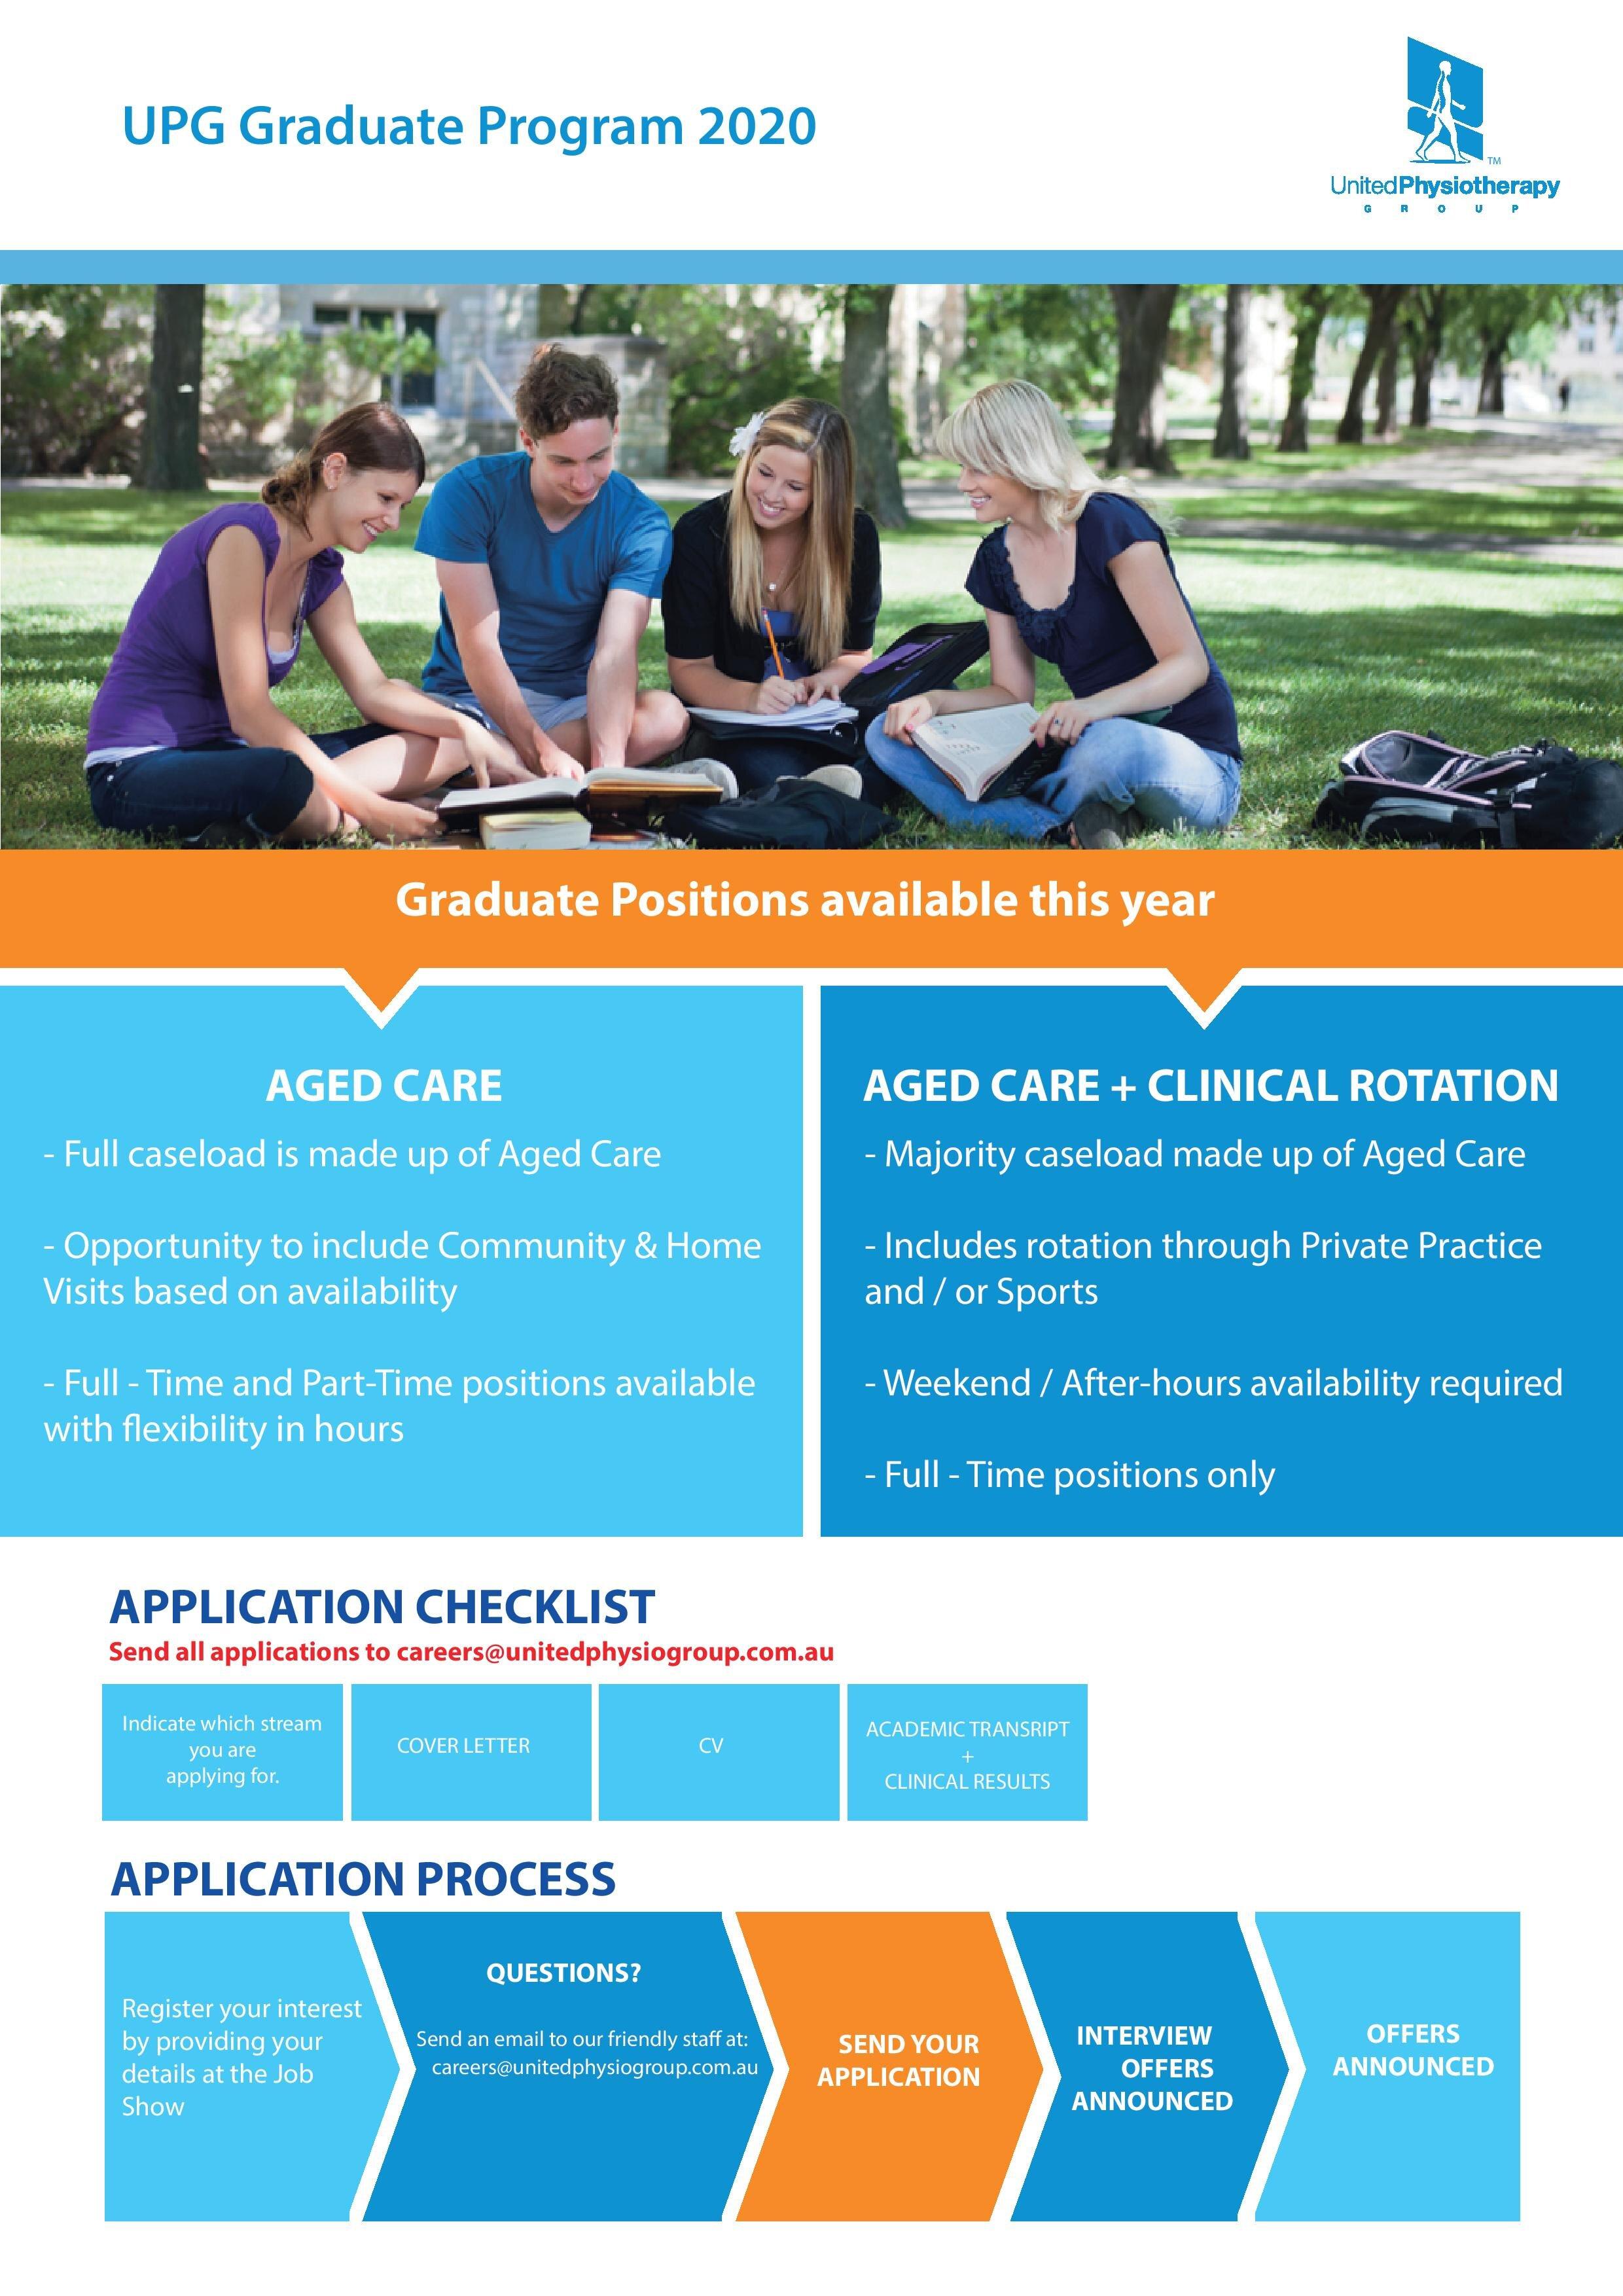 UPG - Graduate Program Overview Front 2020-page-001.jpg